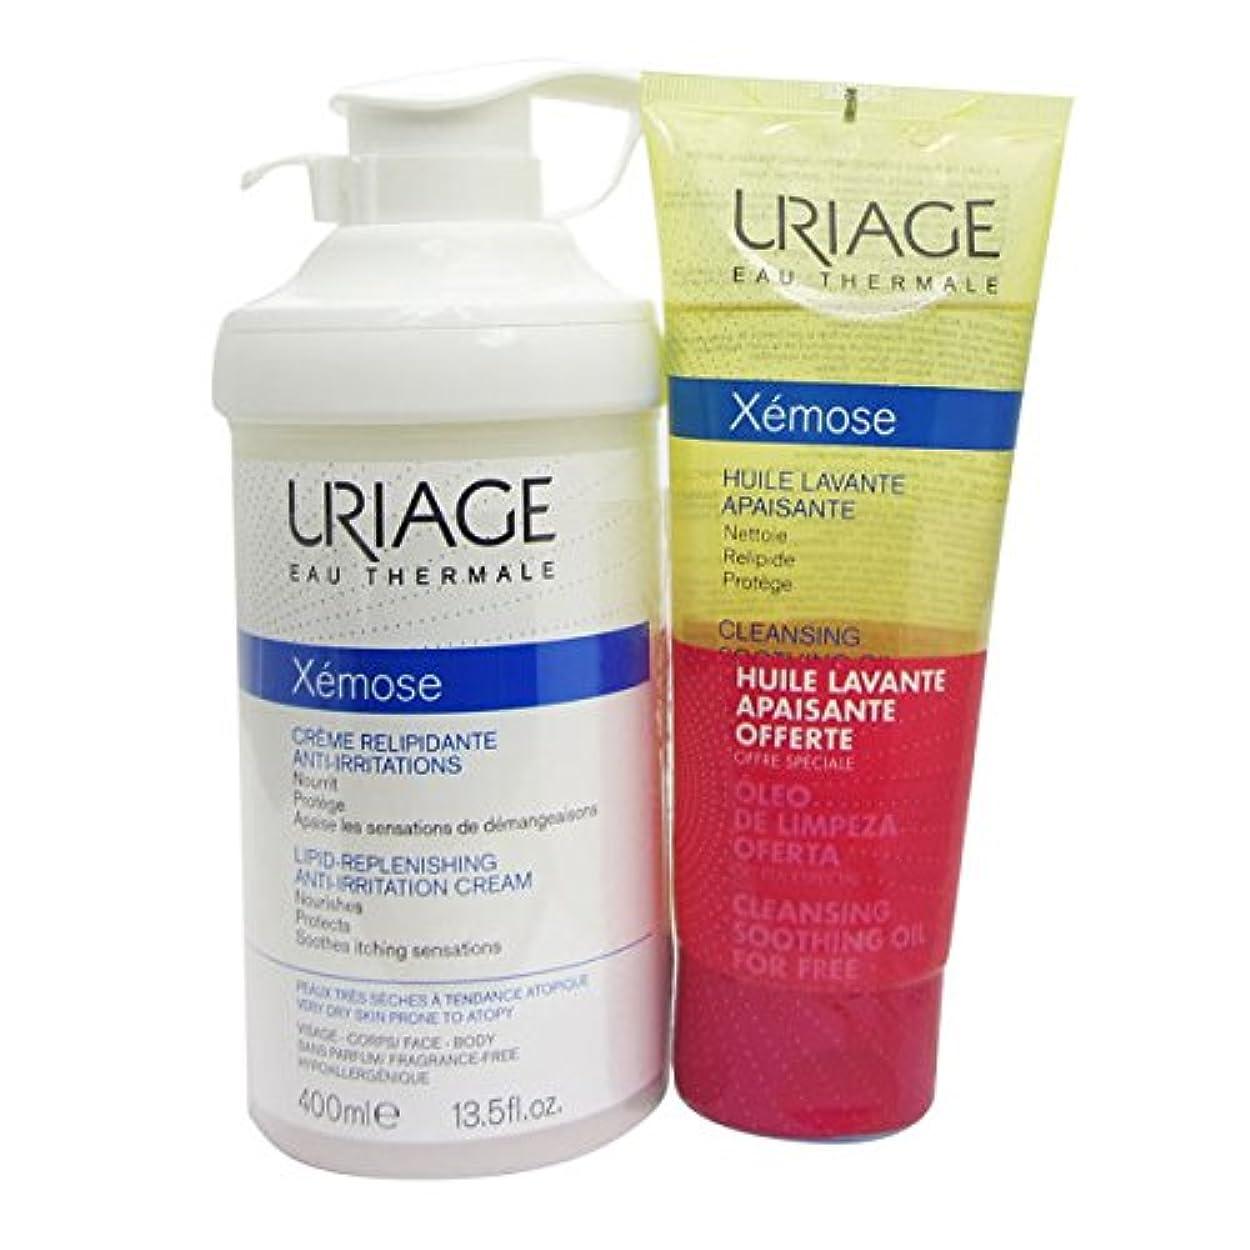 便益便益市民権Uriage Xémose Pack Universal Emollient Cream 400ml + Gift Cleansing Oil